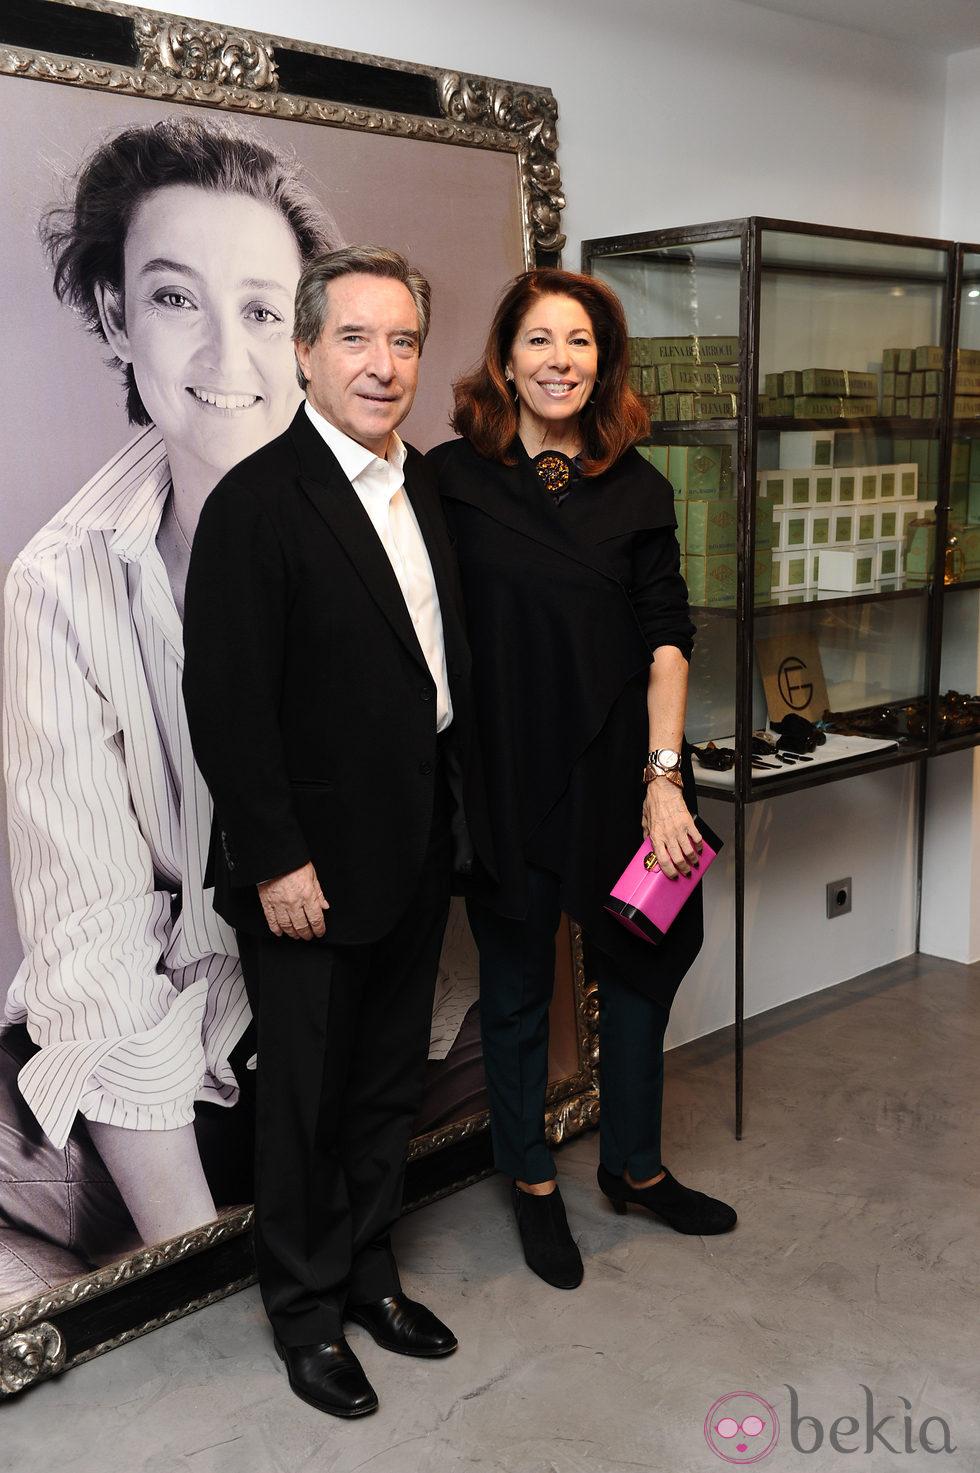 Iñaki Gabilondo en la inauguración de la tienda Elena Benarroch en Madrid